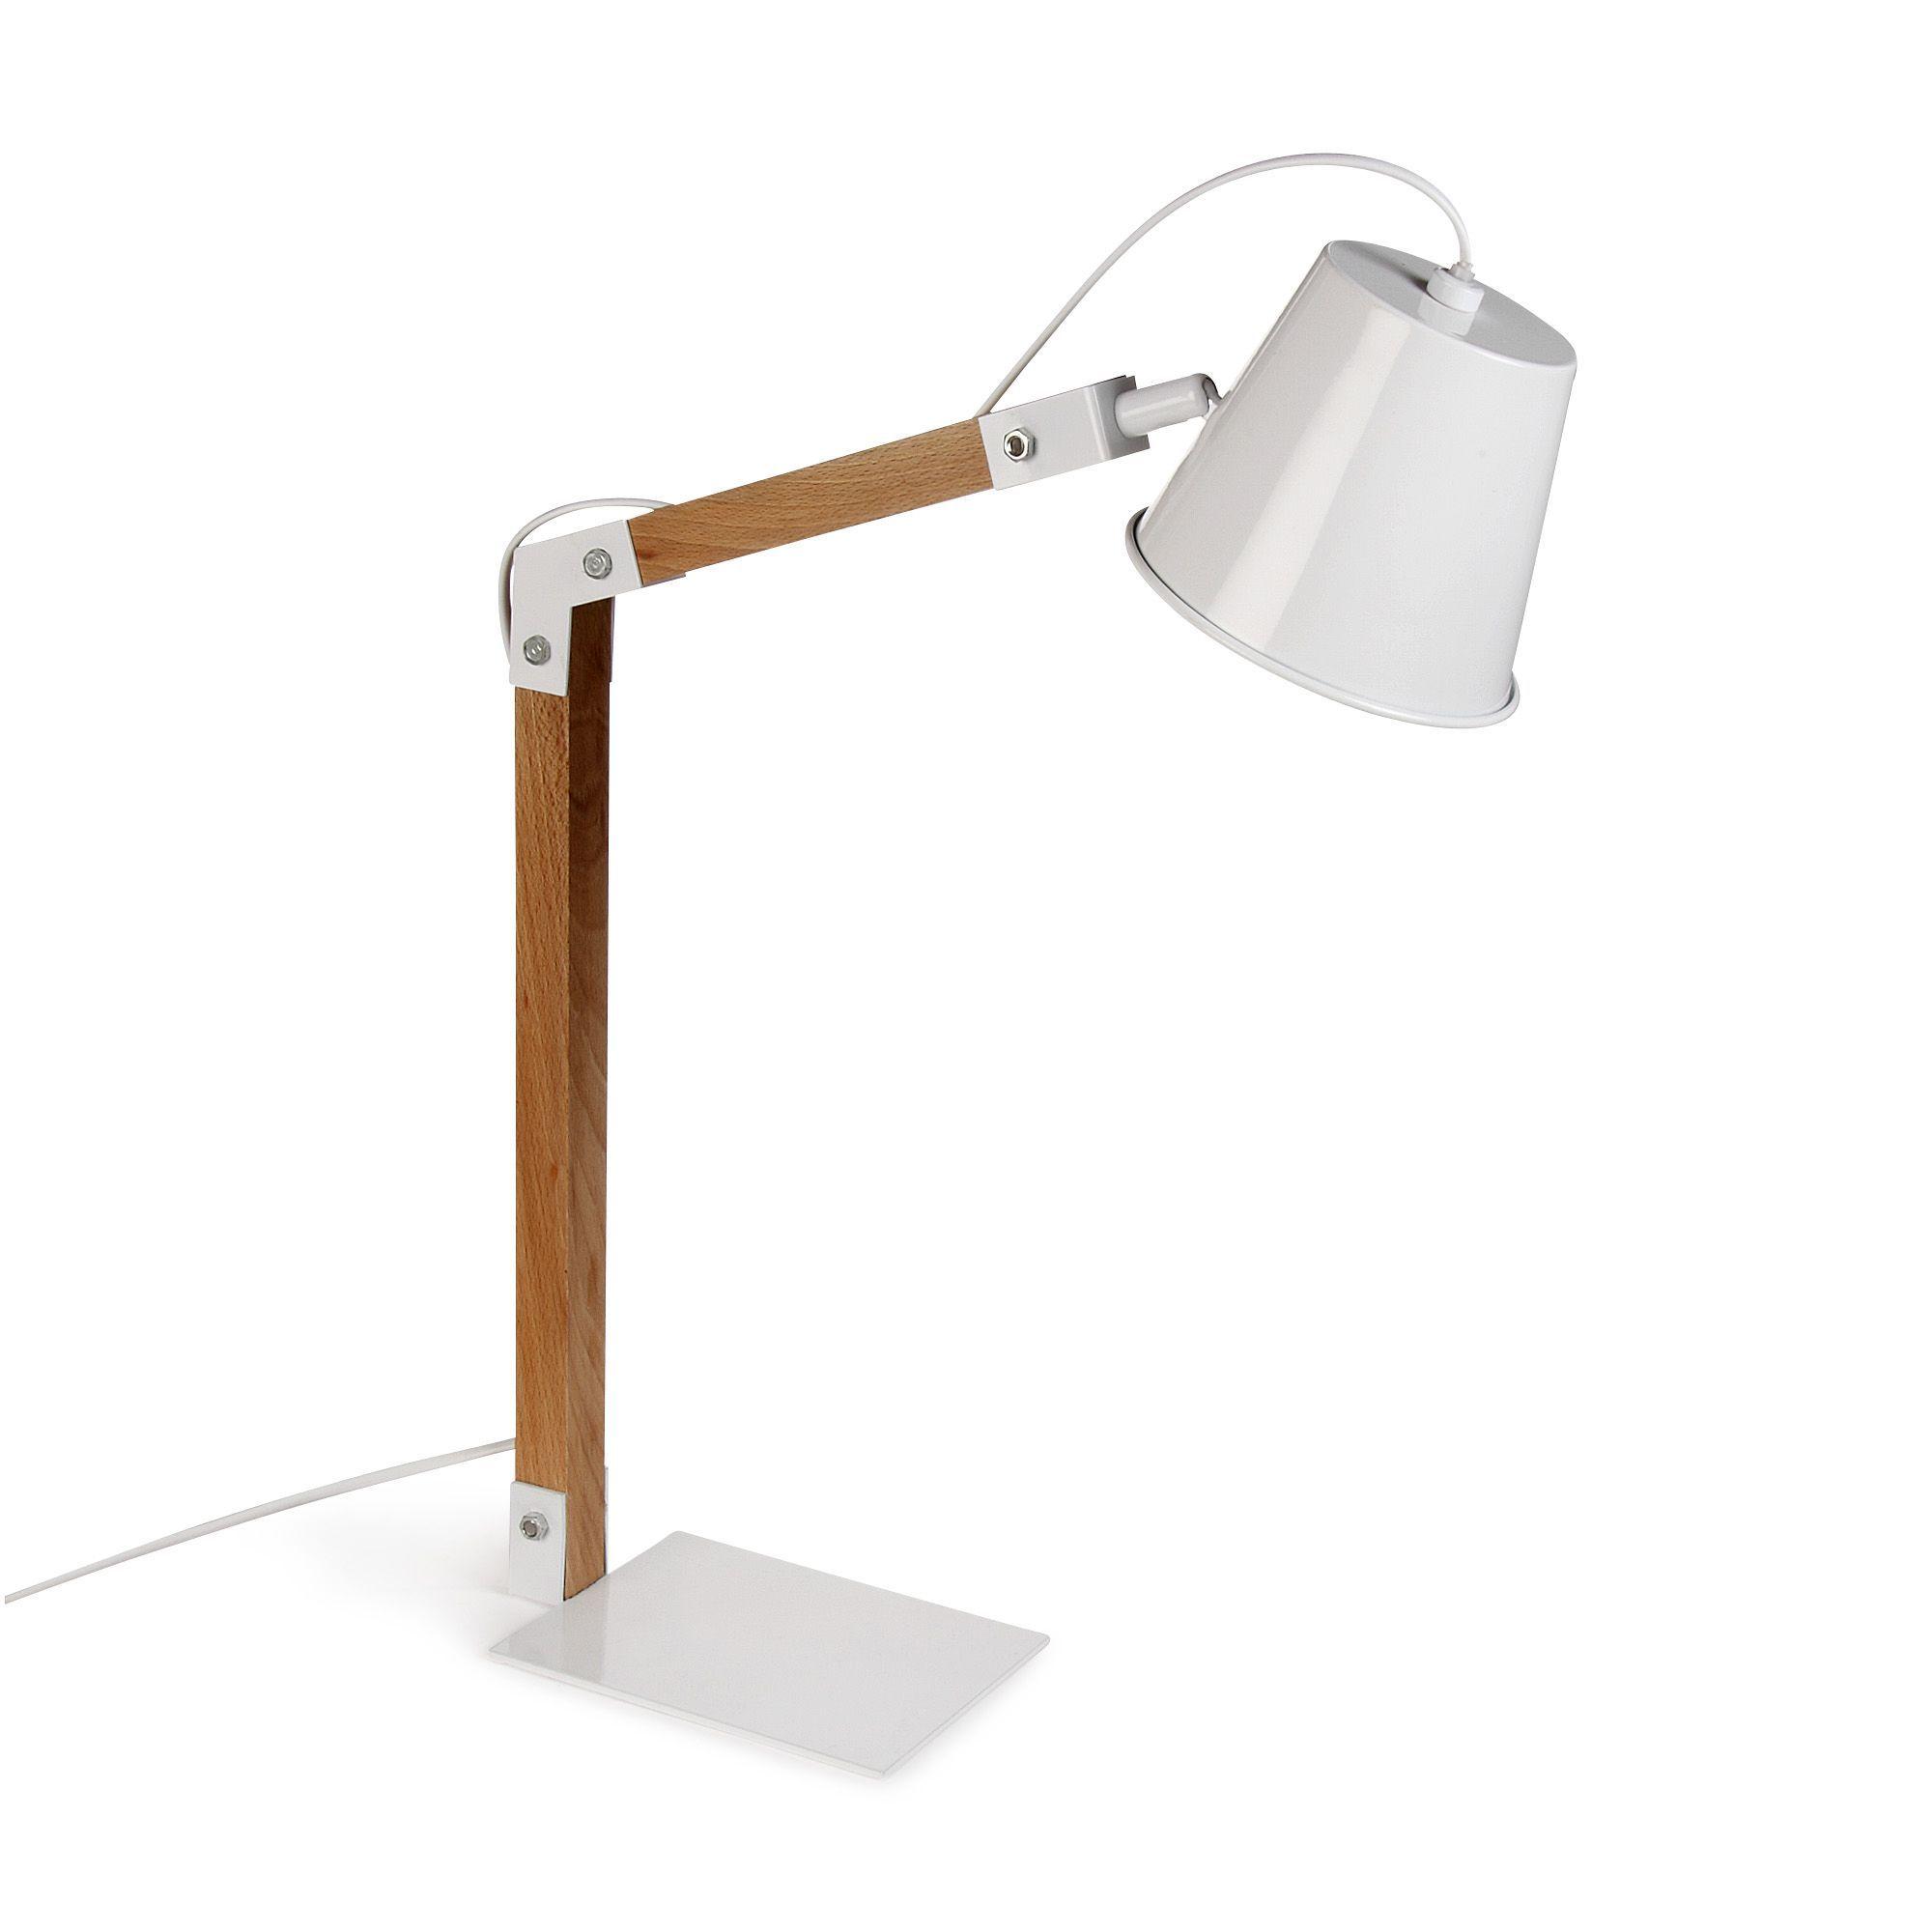 Lampe A Poser En Bois Free Lampe Poser En Bois Naturel With Lampe A